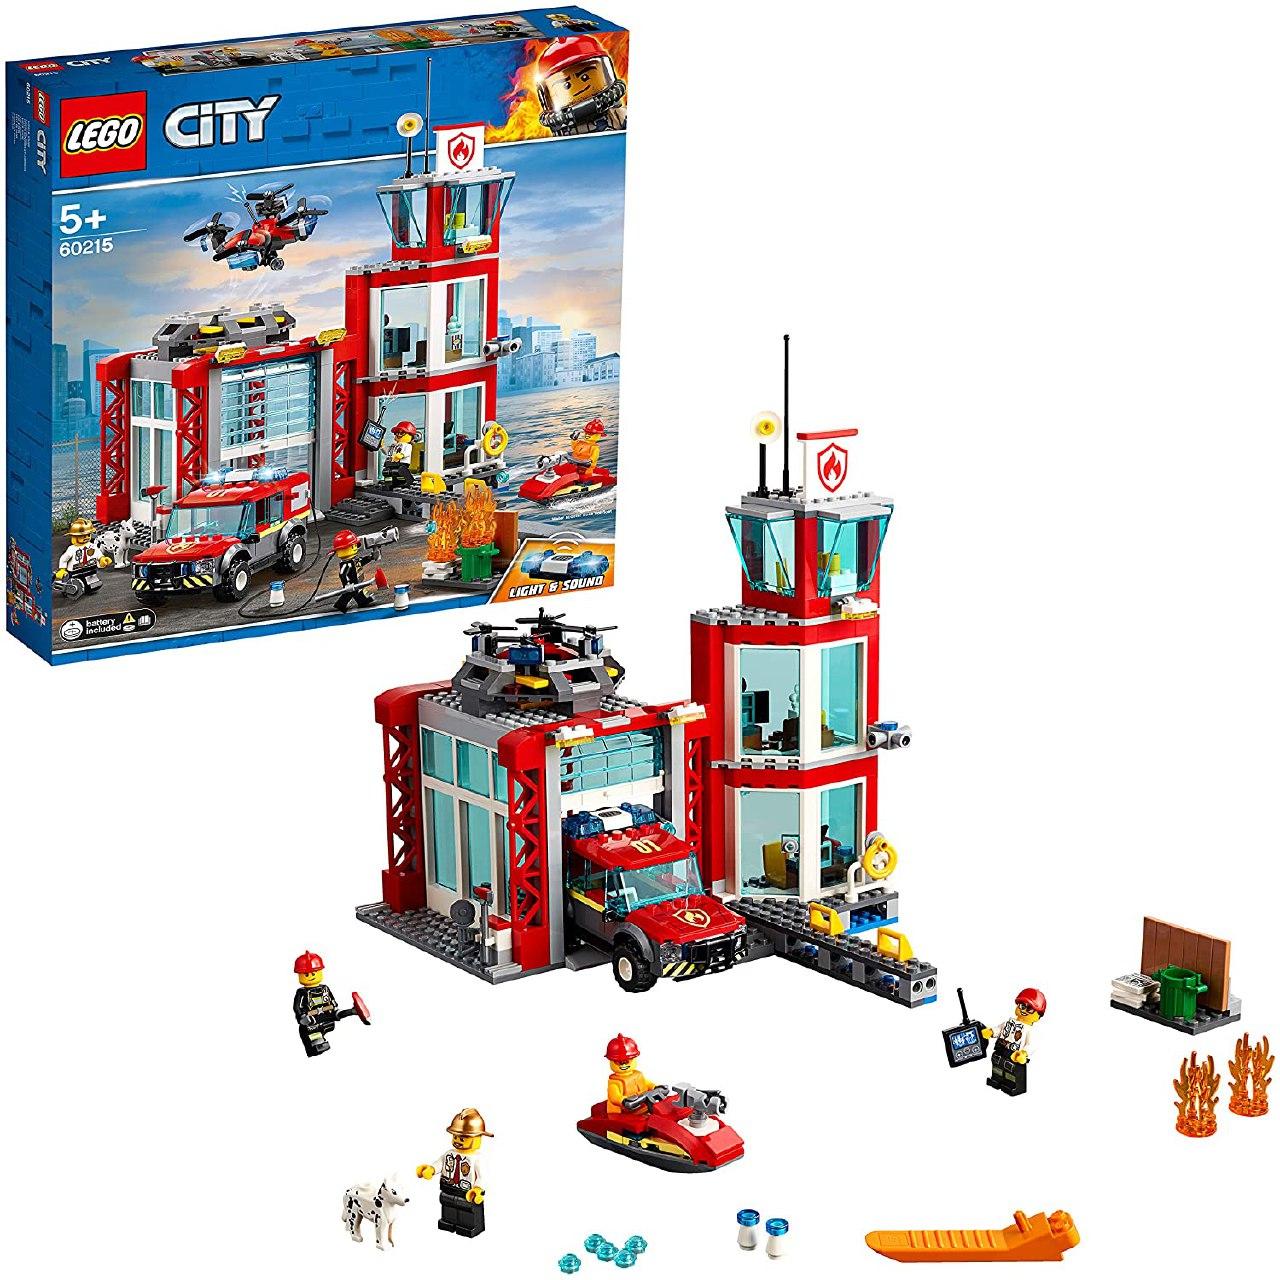 LEGO City Parque Bomberos solo 48.4€